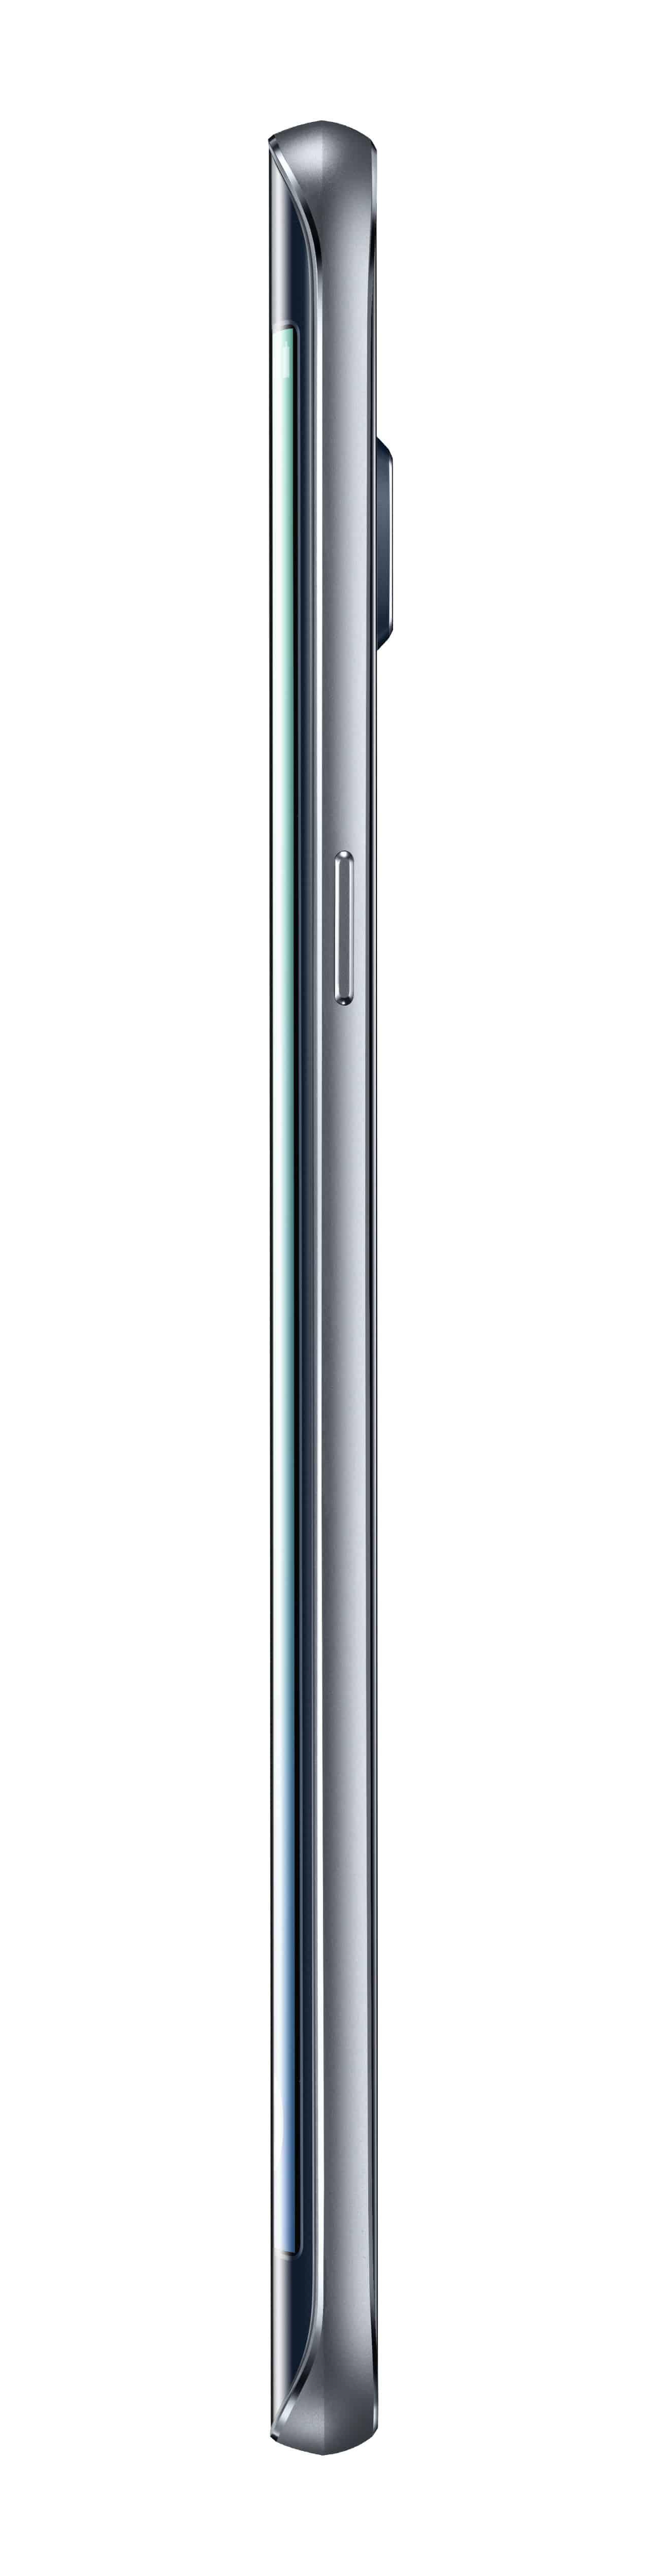 Galaxy S6 Edge Black7